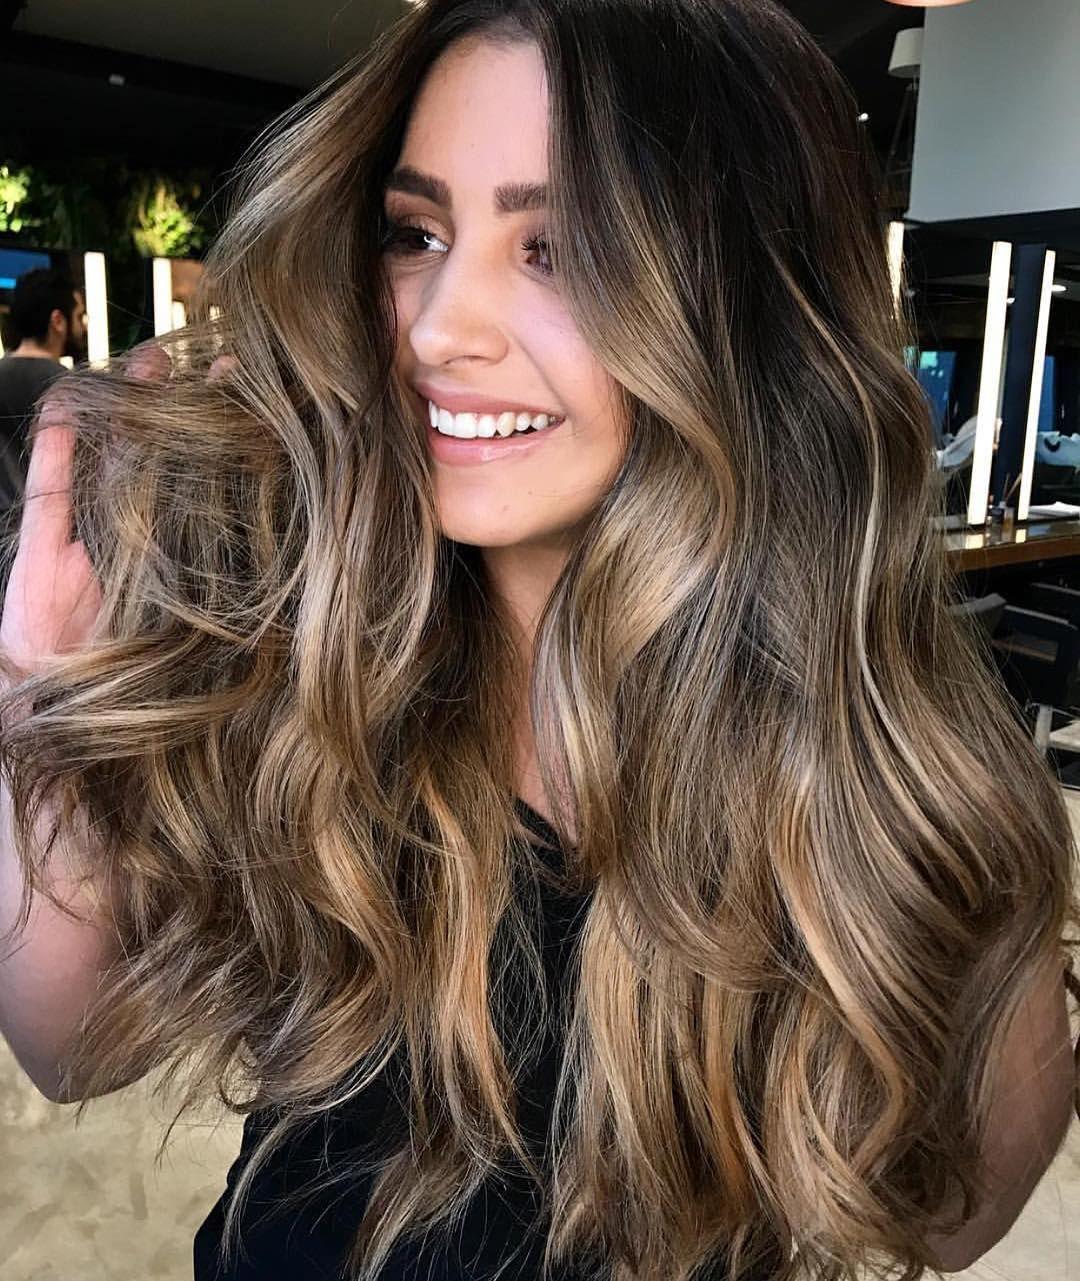 1 722 Likes 17 Comments Balayage Beautiful Hair Bestofbalayage On Insta Brown Blonde Hair Brown Hair With Blonde Highlights Brown Hair With Highlights